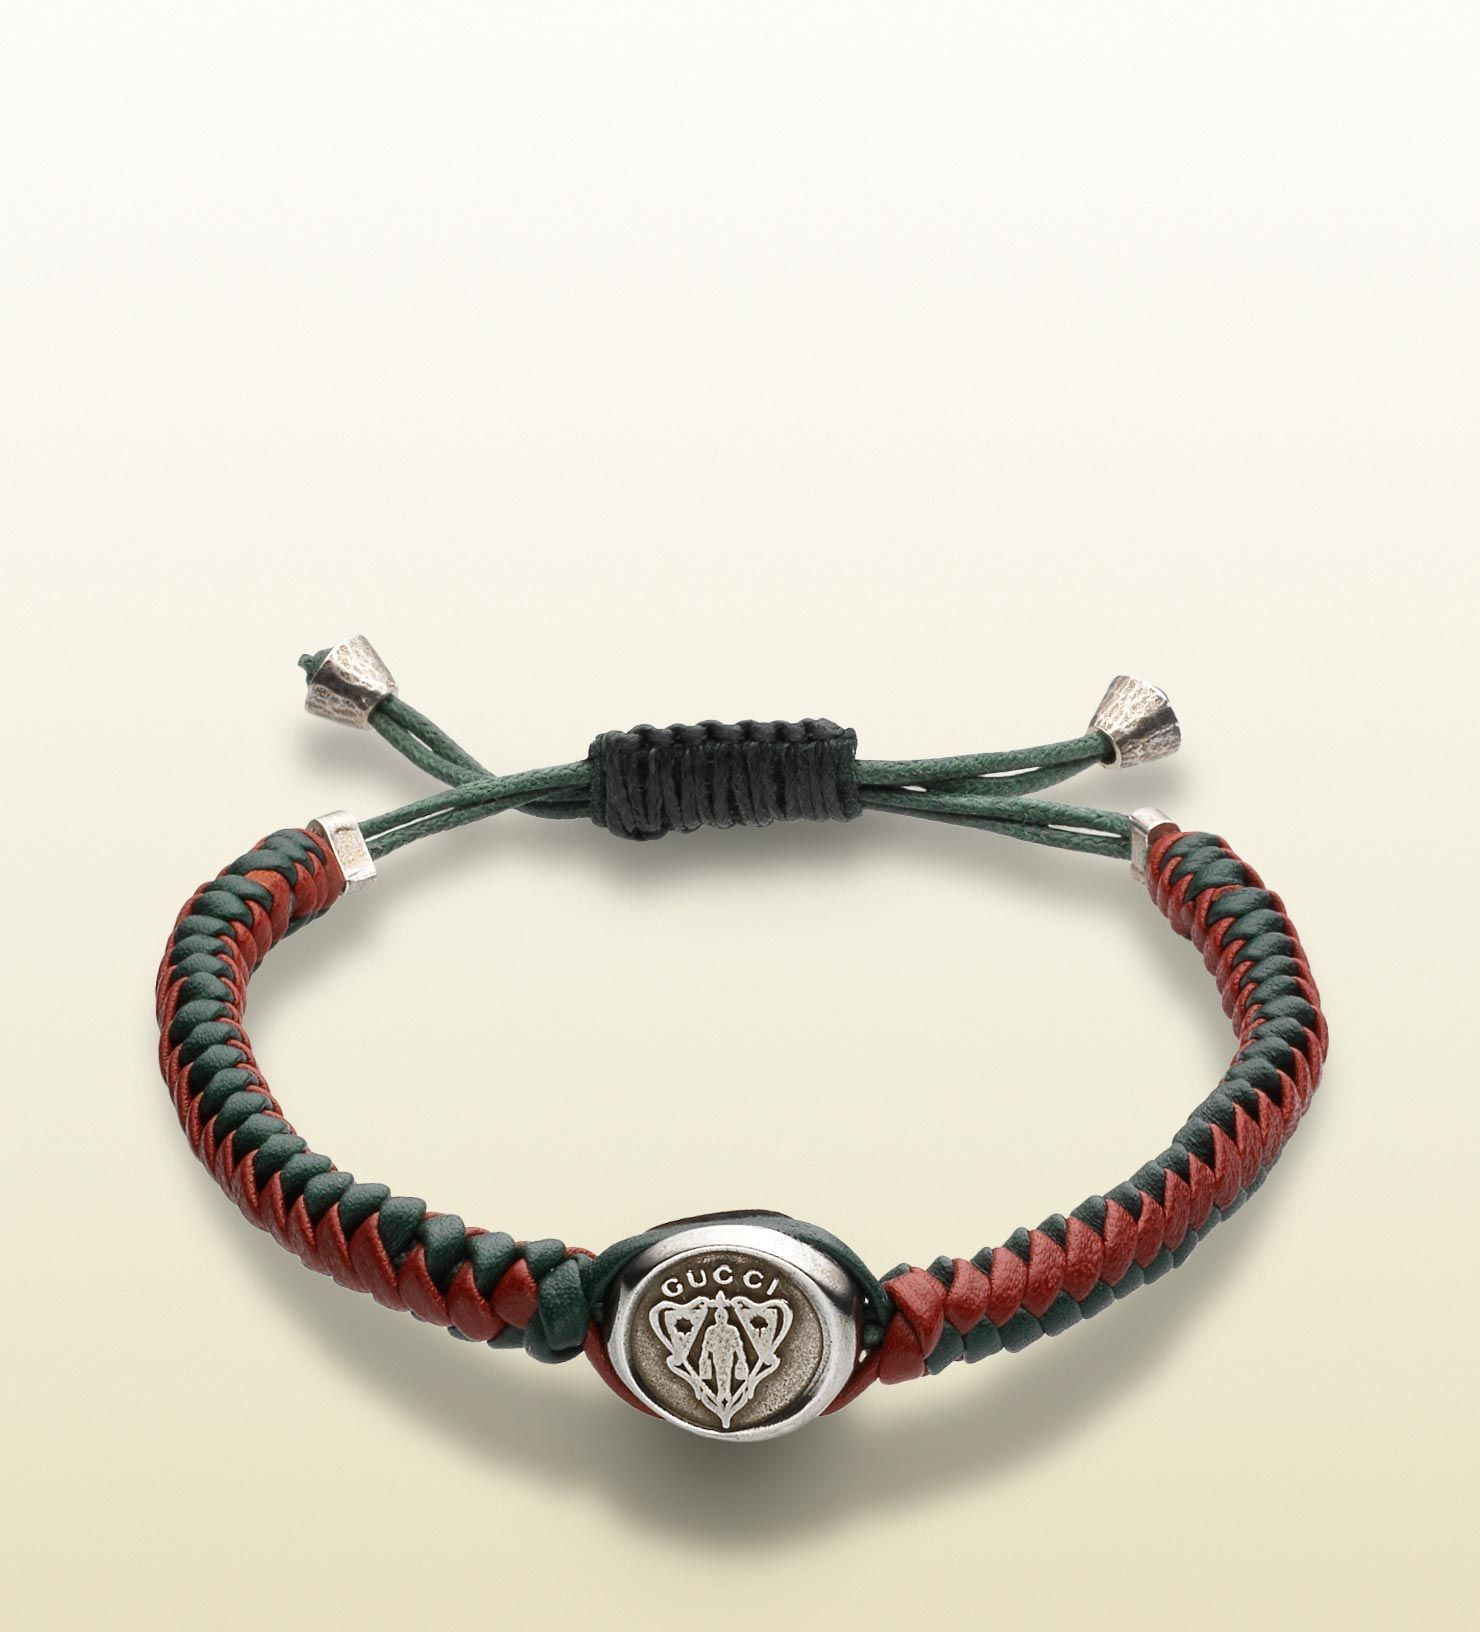 Gucci crest bracelet jewelry pinterest